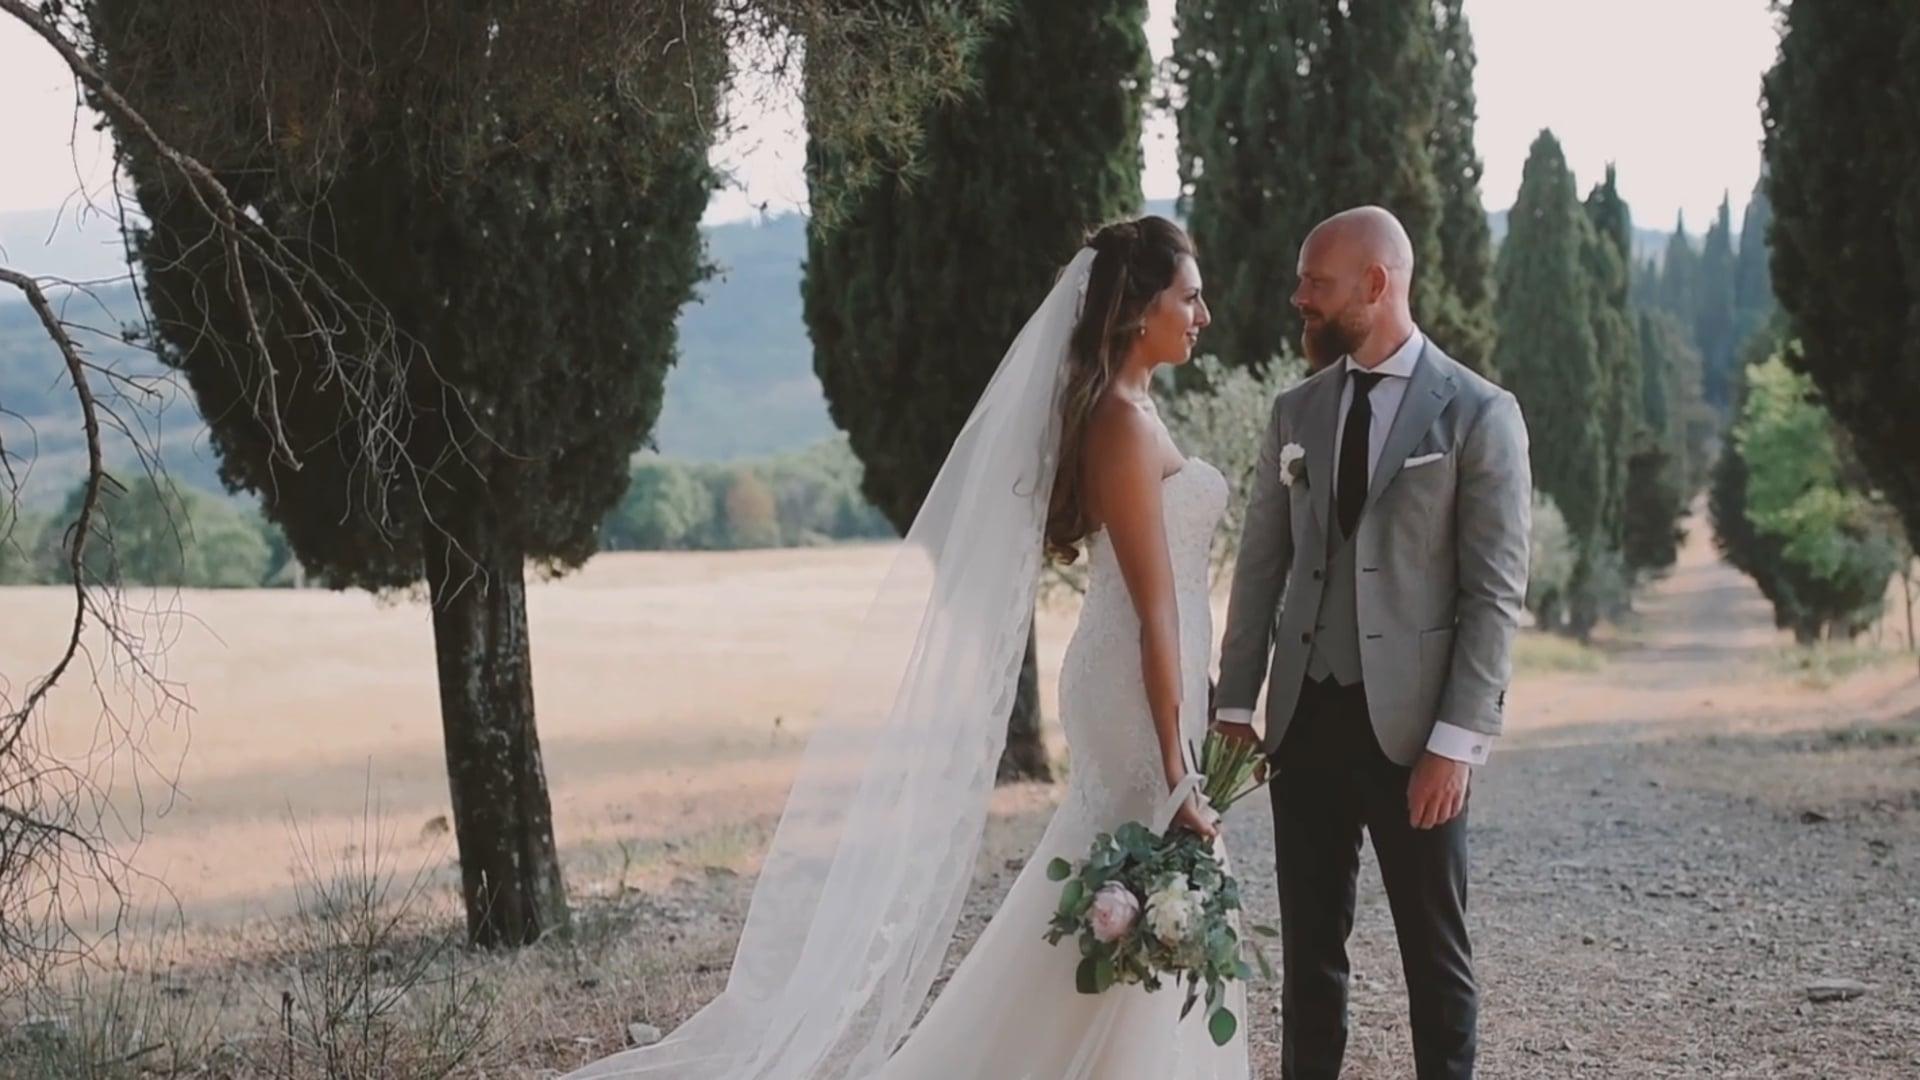 Ramon & Laura - An epic Italian wedding